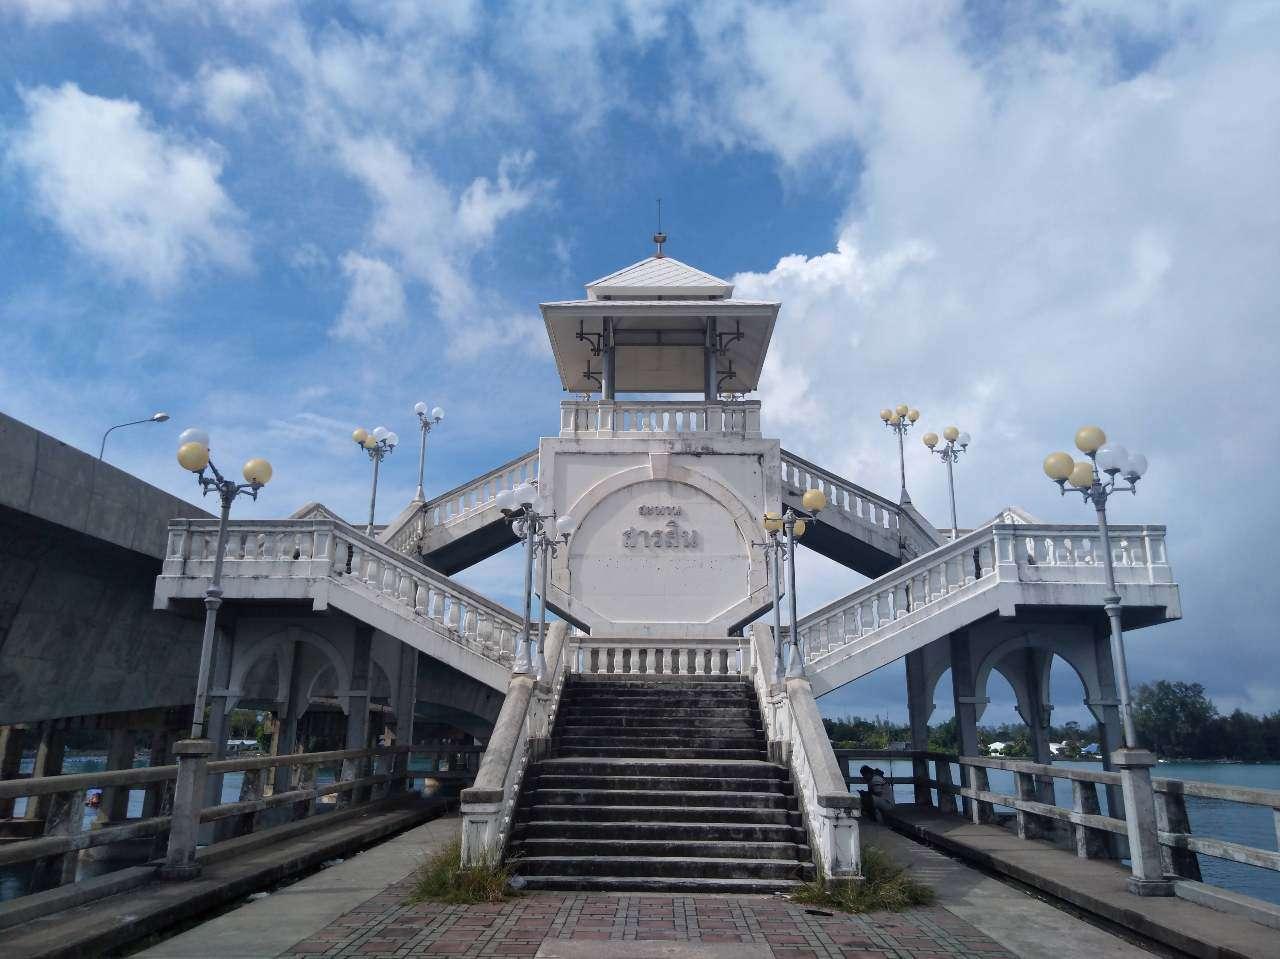 Lookout tower on the old Sarasin Bridge of Phuket, Thailand